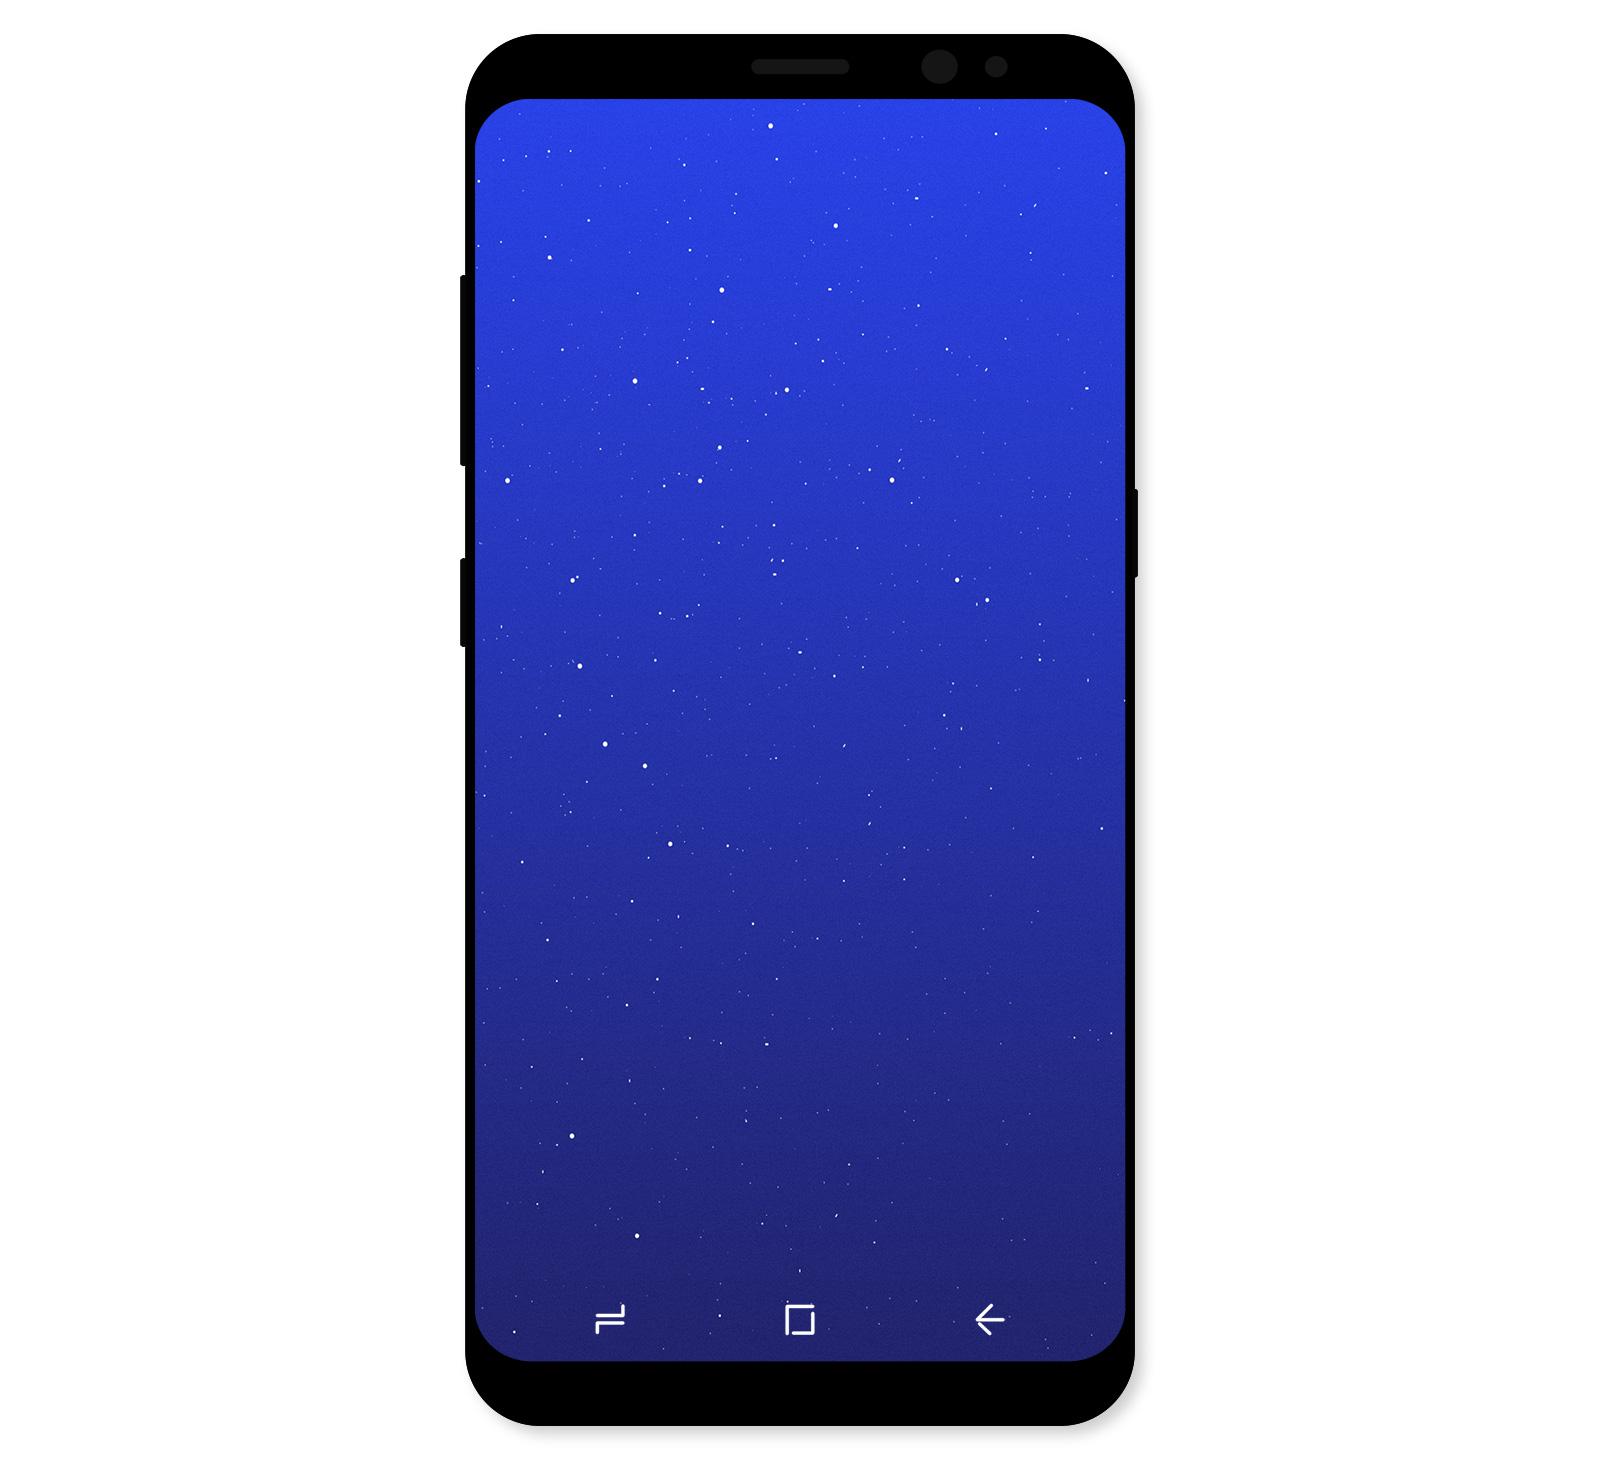 Galaxy S8 Flat Mockup - Free PSD Resource- Download Link